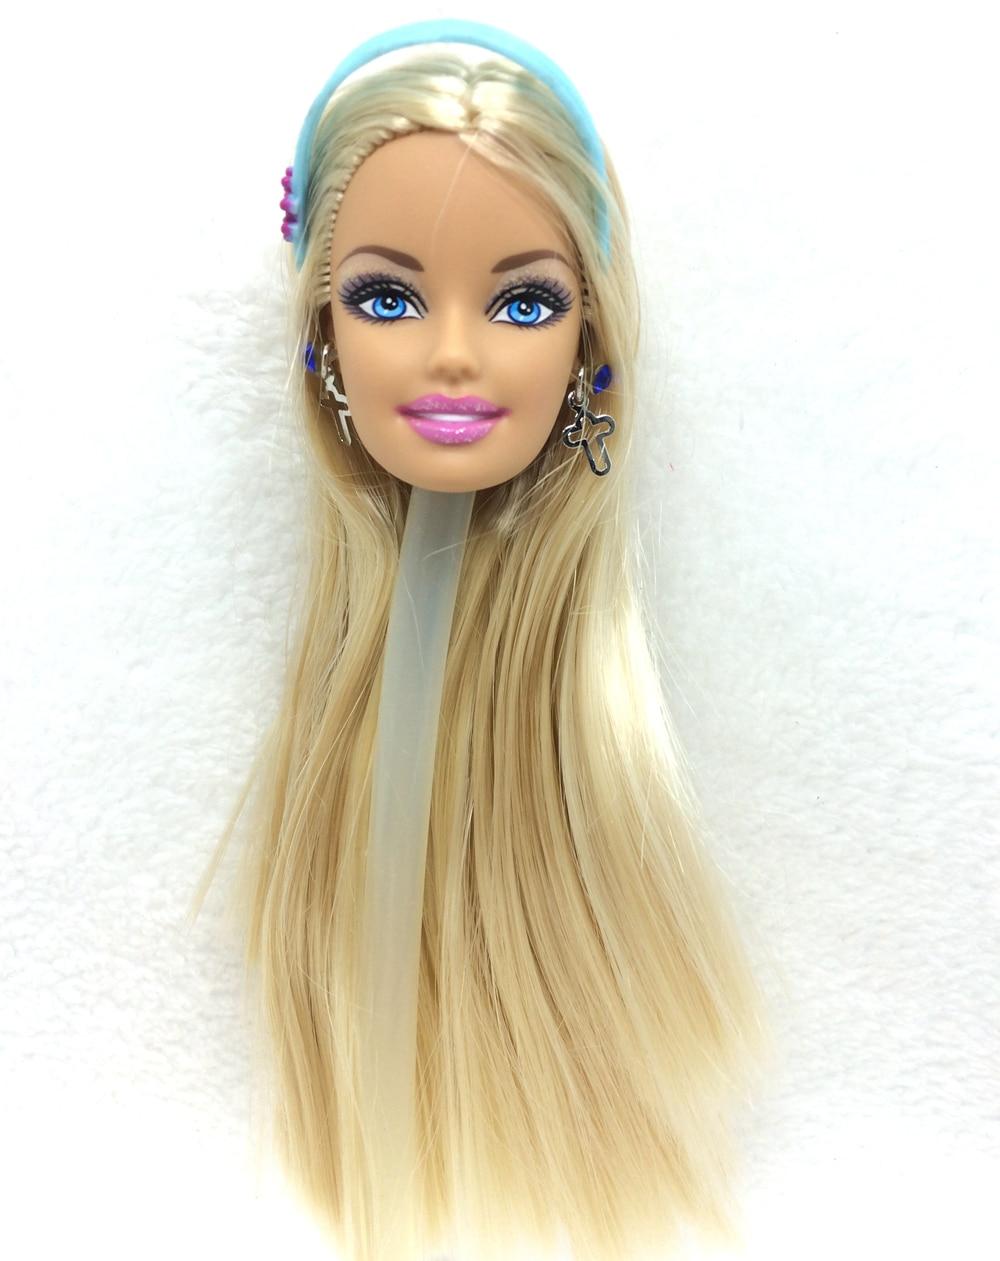 NK One Pcs Original font b Doll b font Head With 6 pcs necklace For Barbie